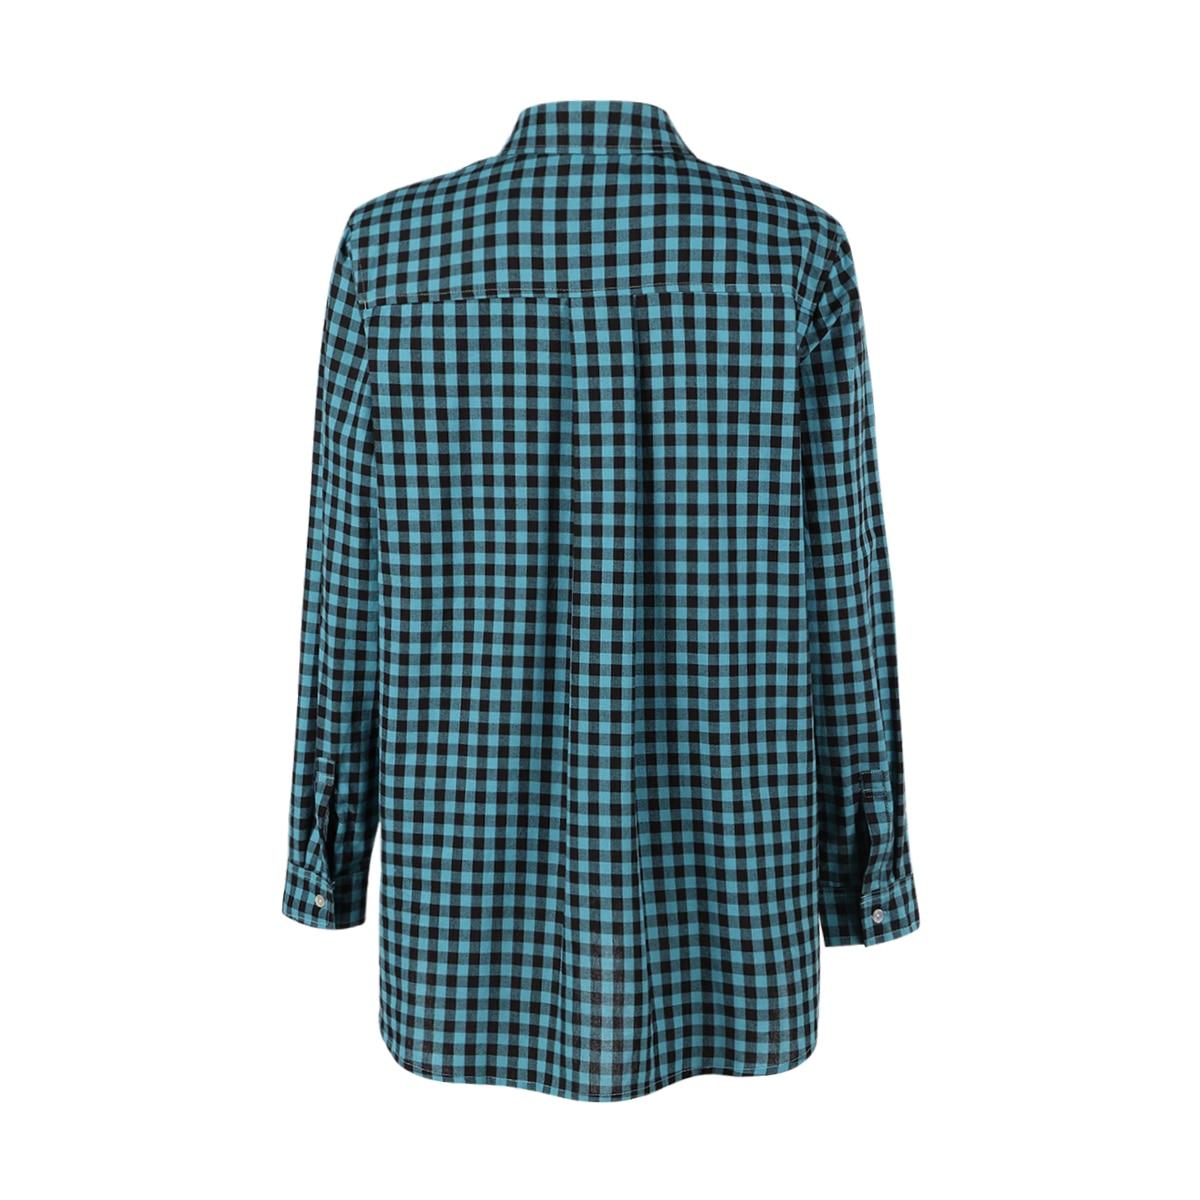 MCO Autumn Basic Plus Size Check Top For Office Ladies Simple Oversized Women Blouse Classic Plaid Shirt Big Size 5xl 6xl 7xl 1